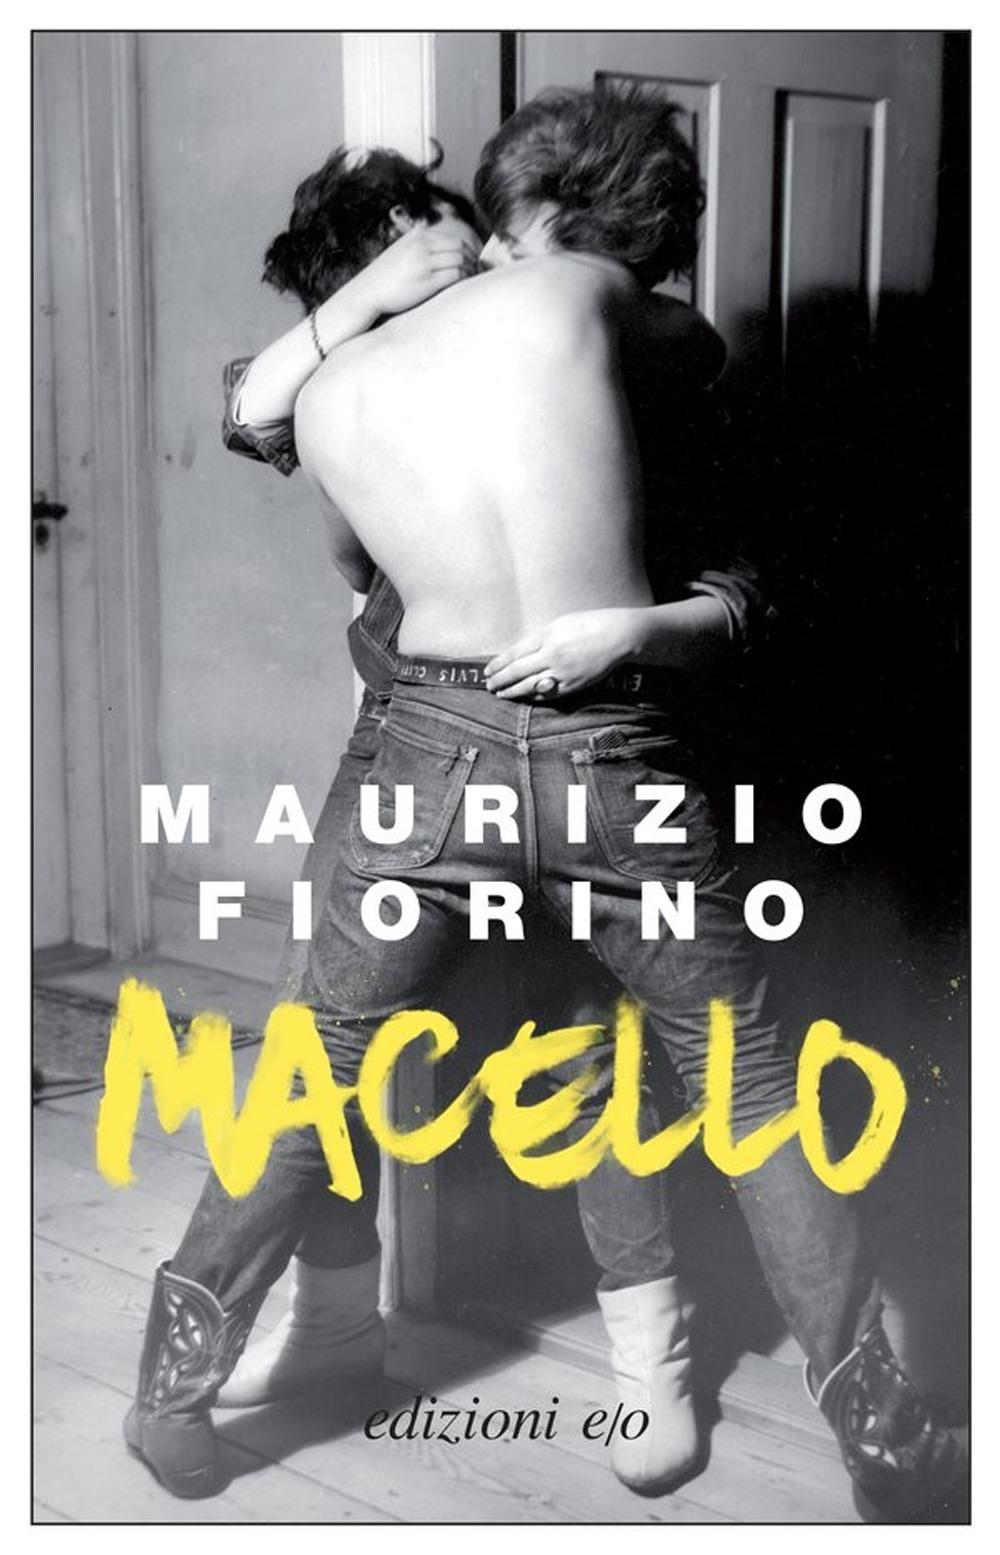 MACELLO - 9788833573656